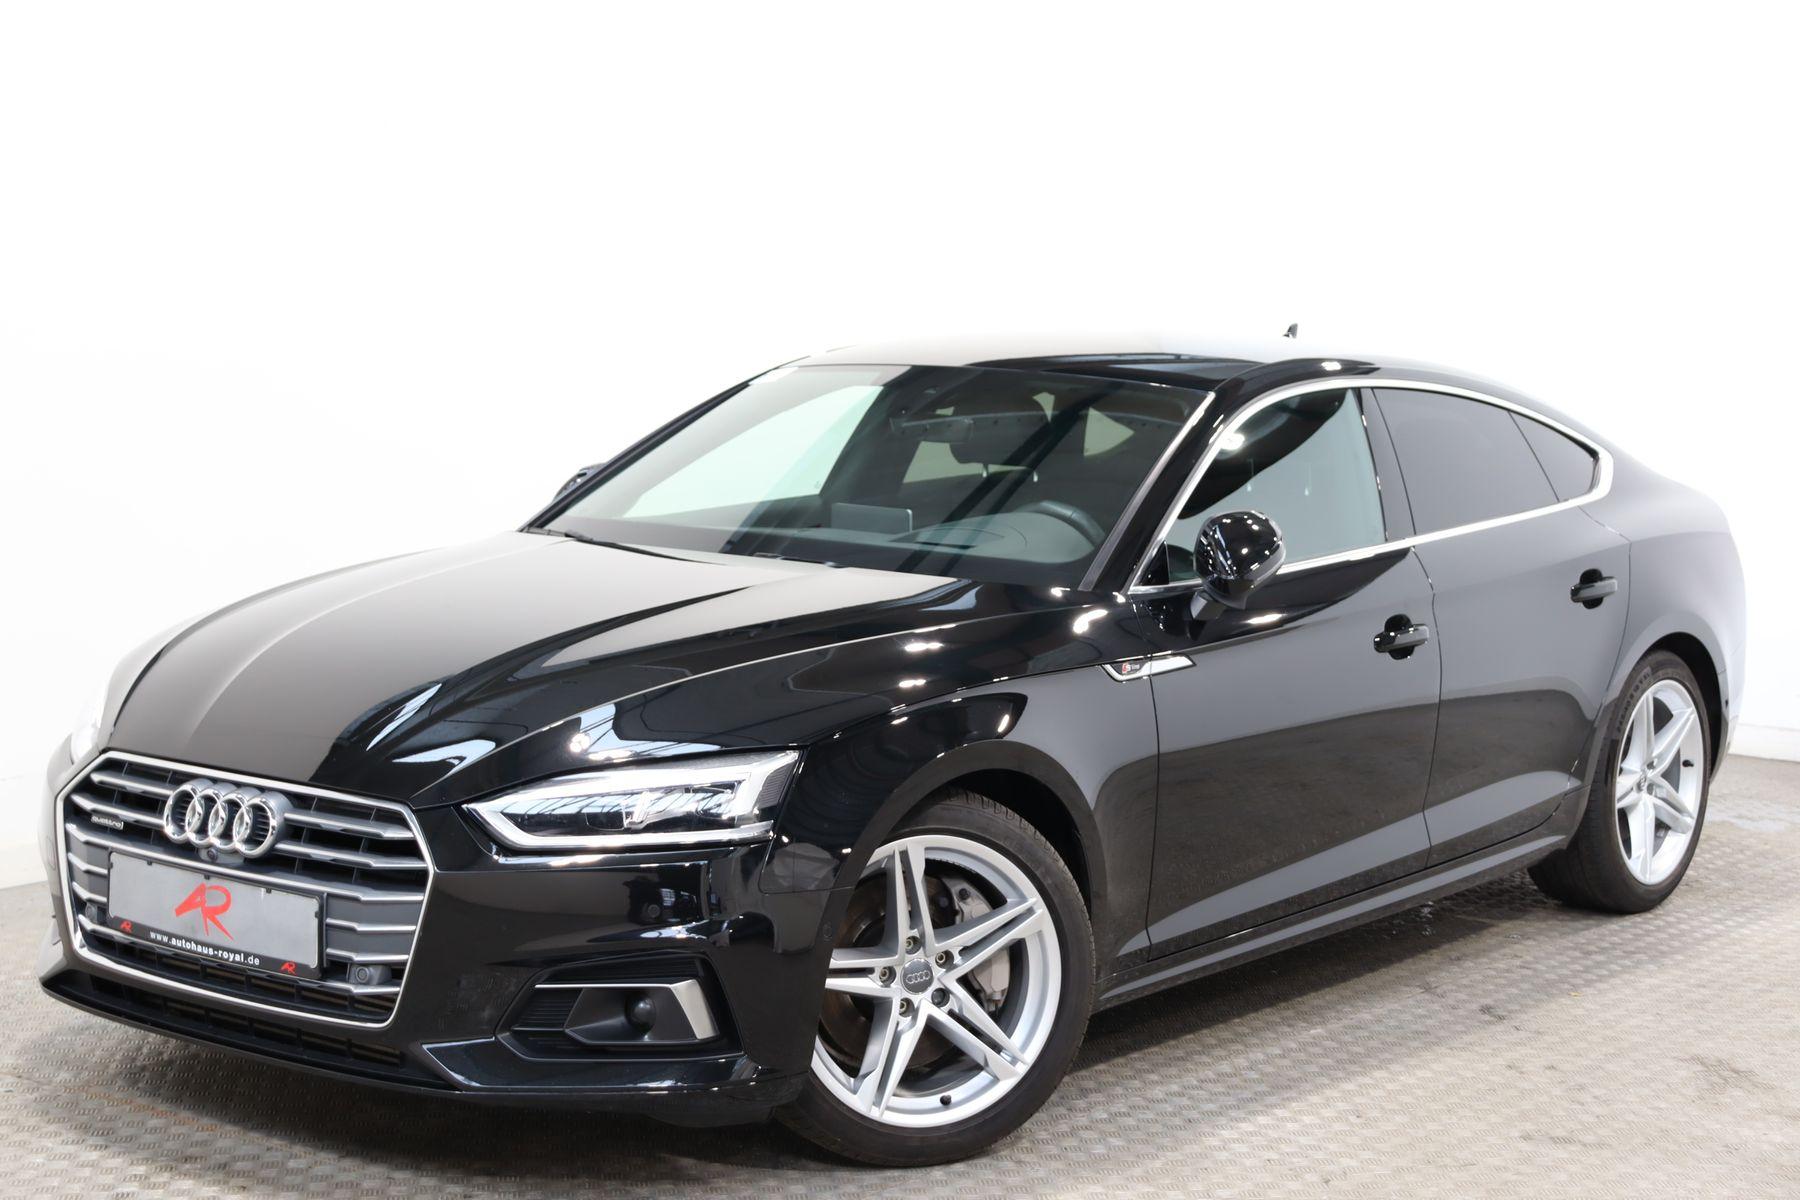 Audi A5 SB 3.0 TDI qu S LINE BANG+O,VIRTUAL,HUD,ACC, Jahr 2017, Diesel